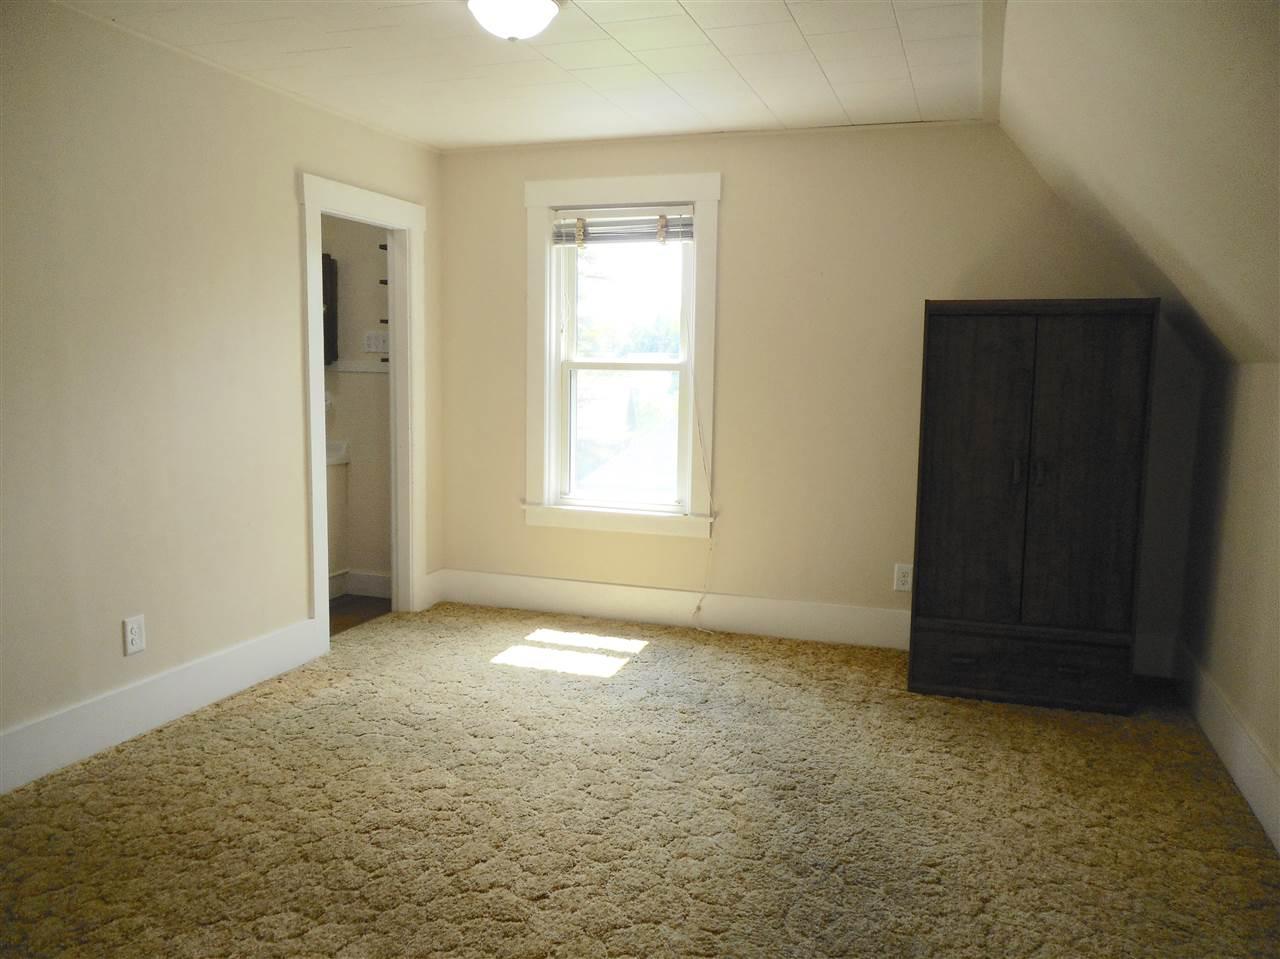 Vermont-Real-Estate-4651704-20